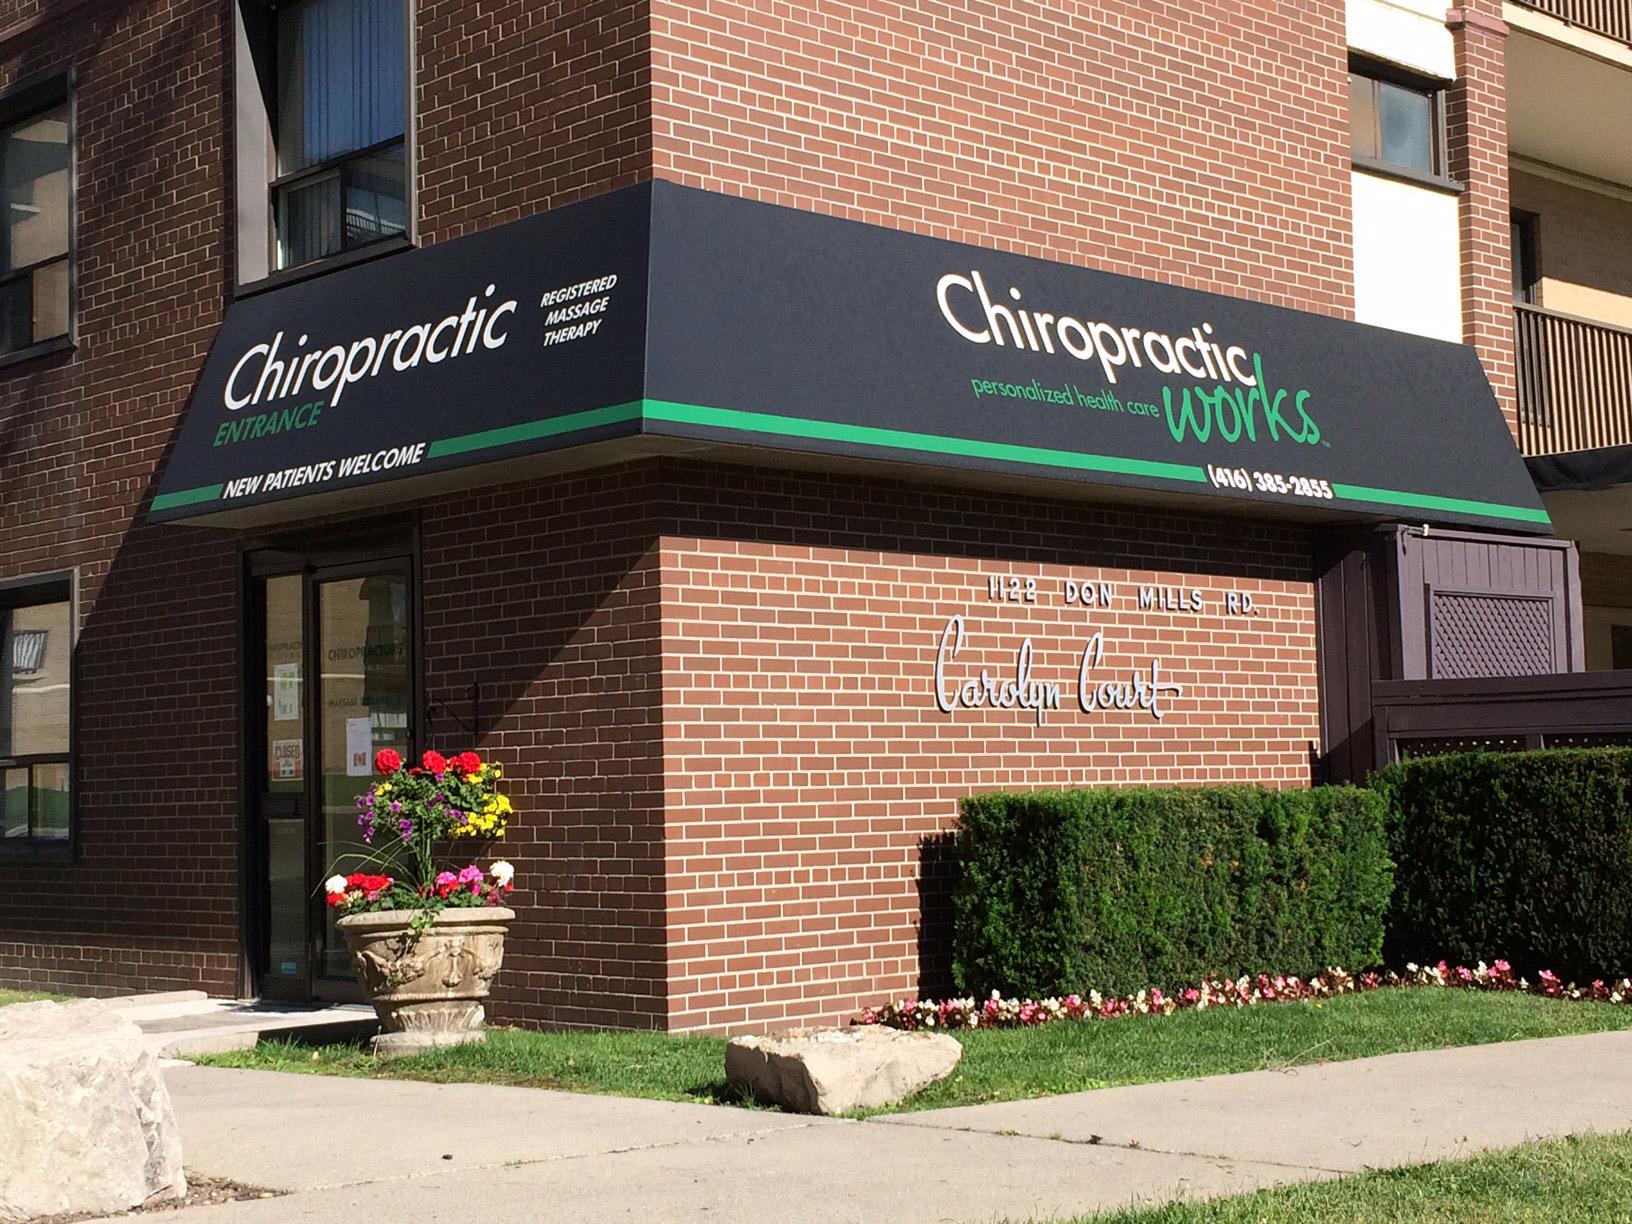 Chiropractic-Works-Store